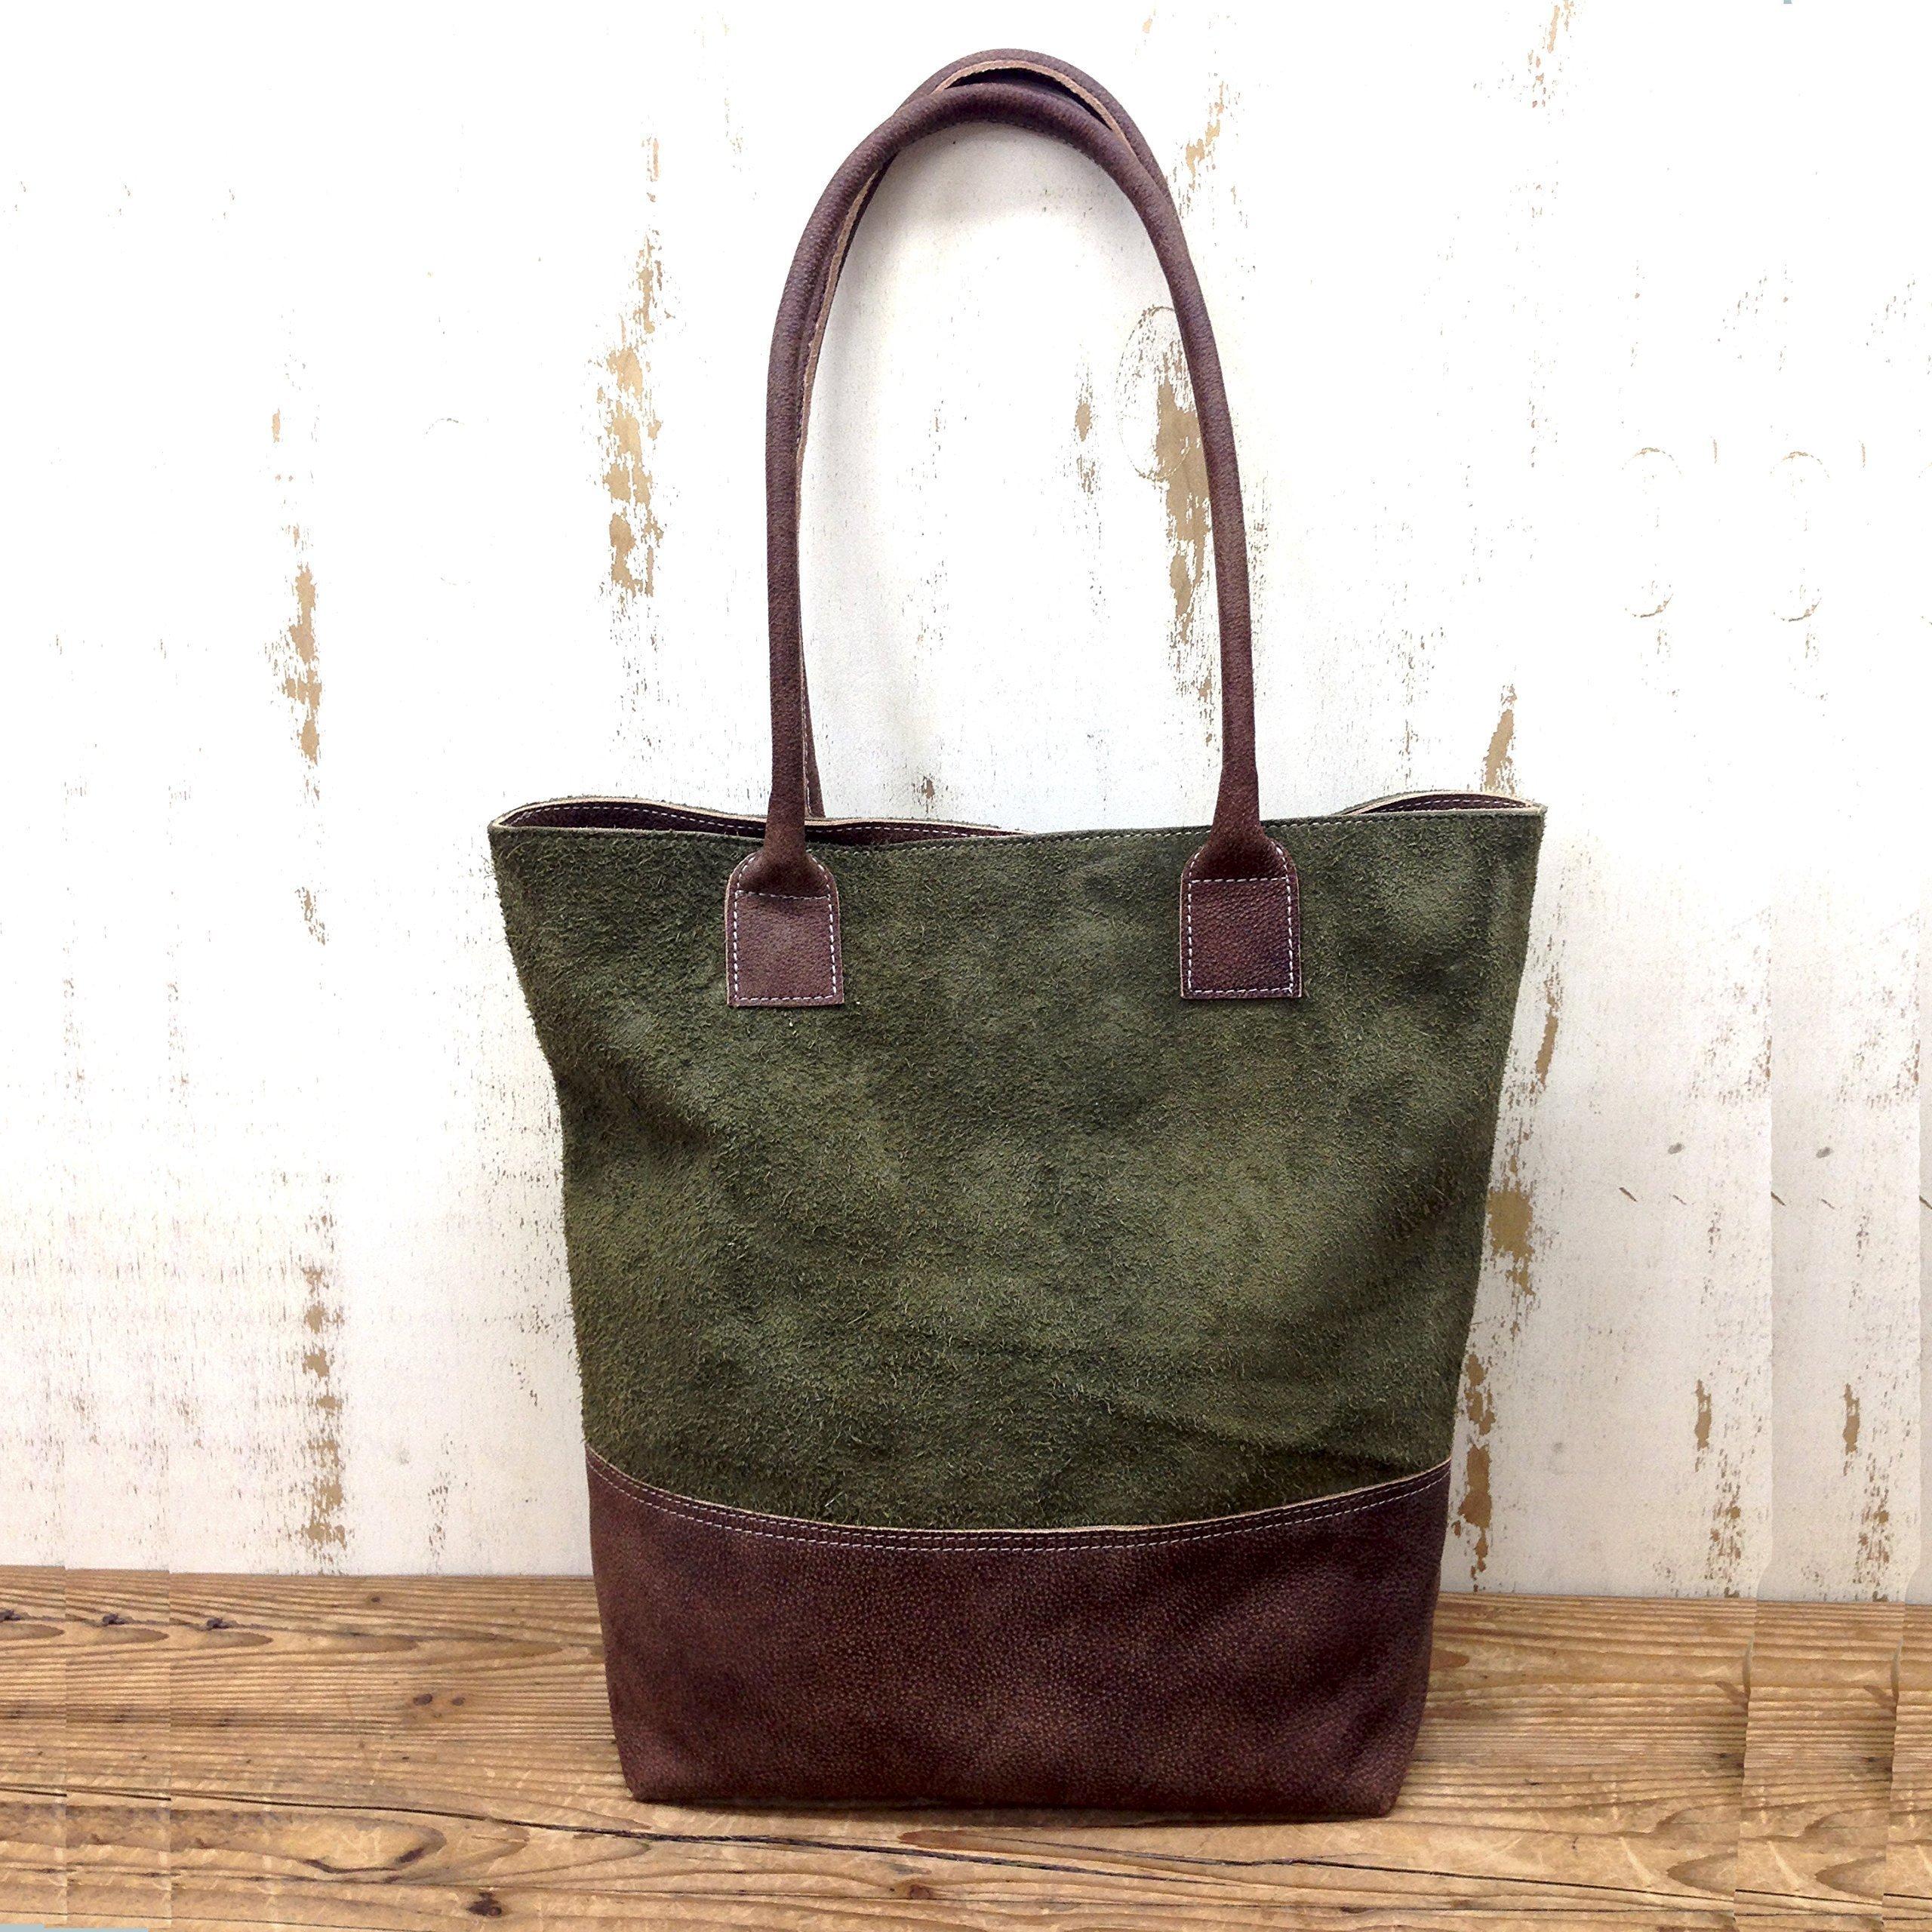 Green suede leather tote bag , distressed brown Book shopper handbag Working Handmade Fashion purse